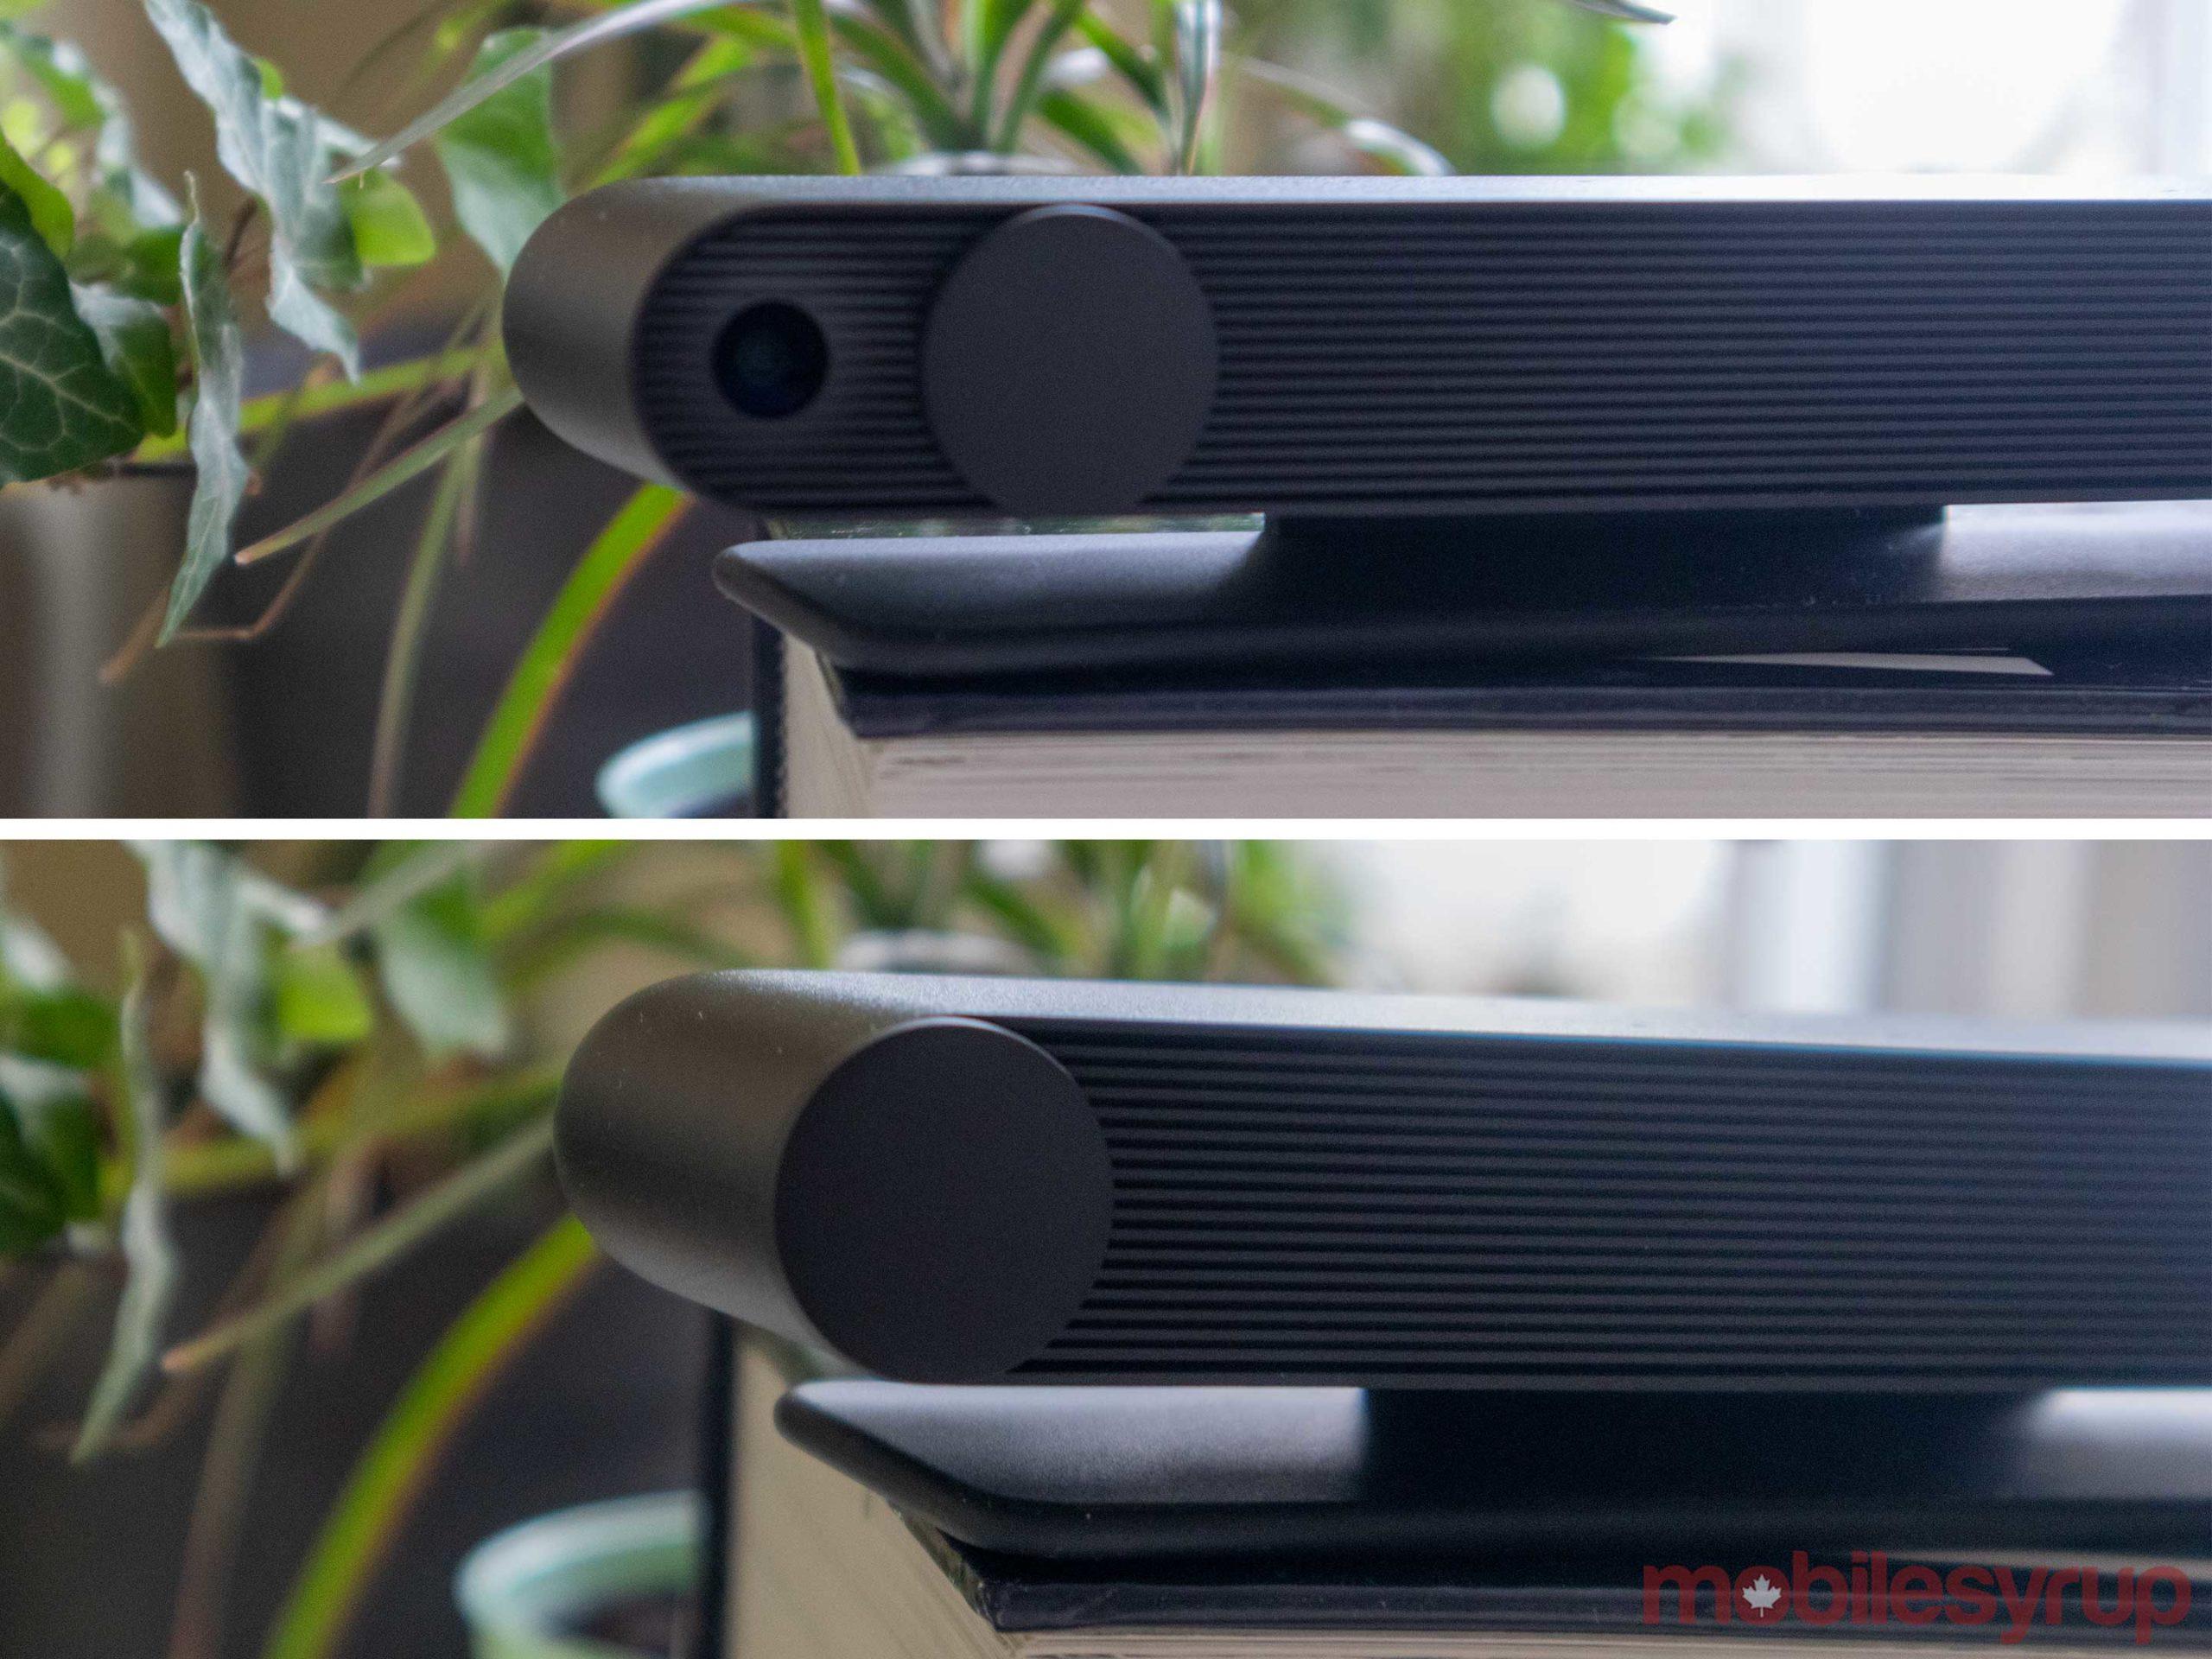 Portal TV camera scaled